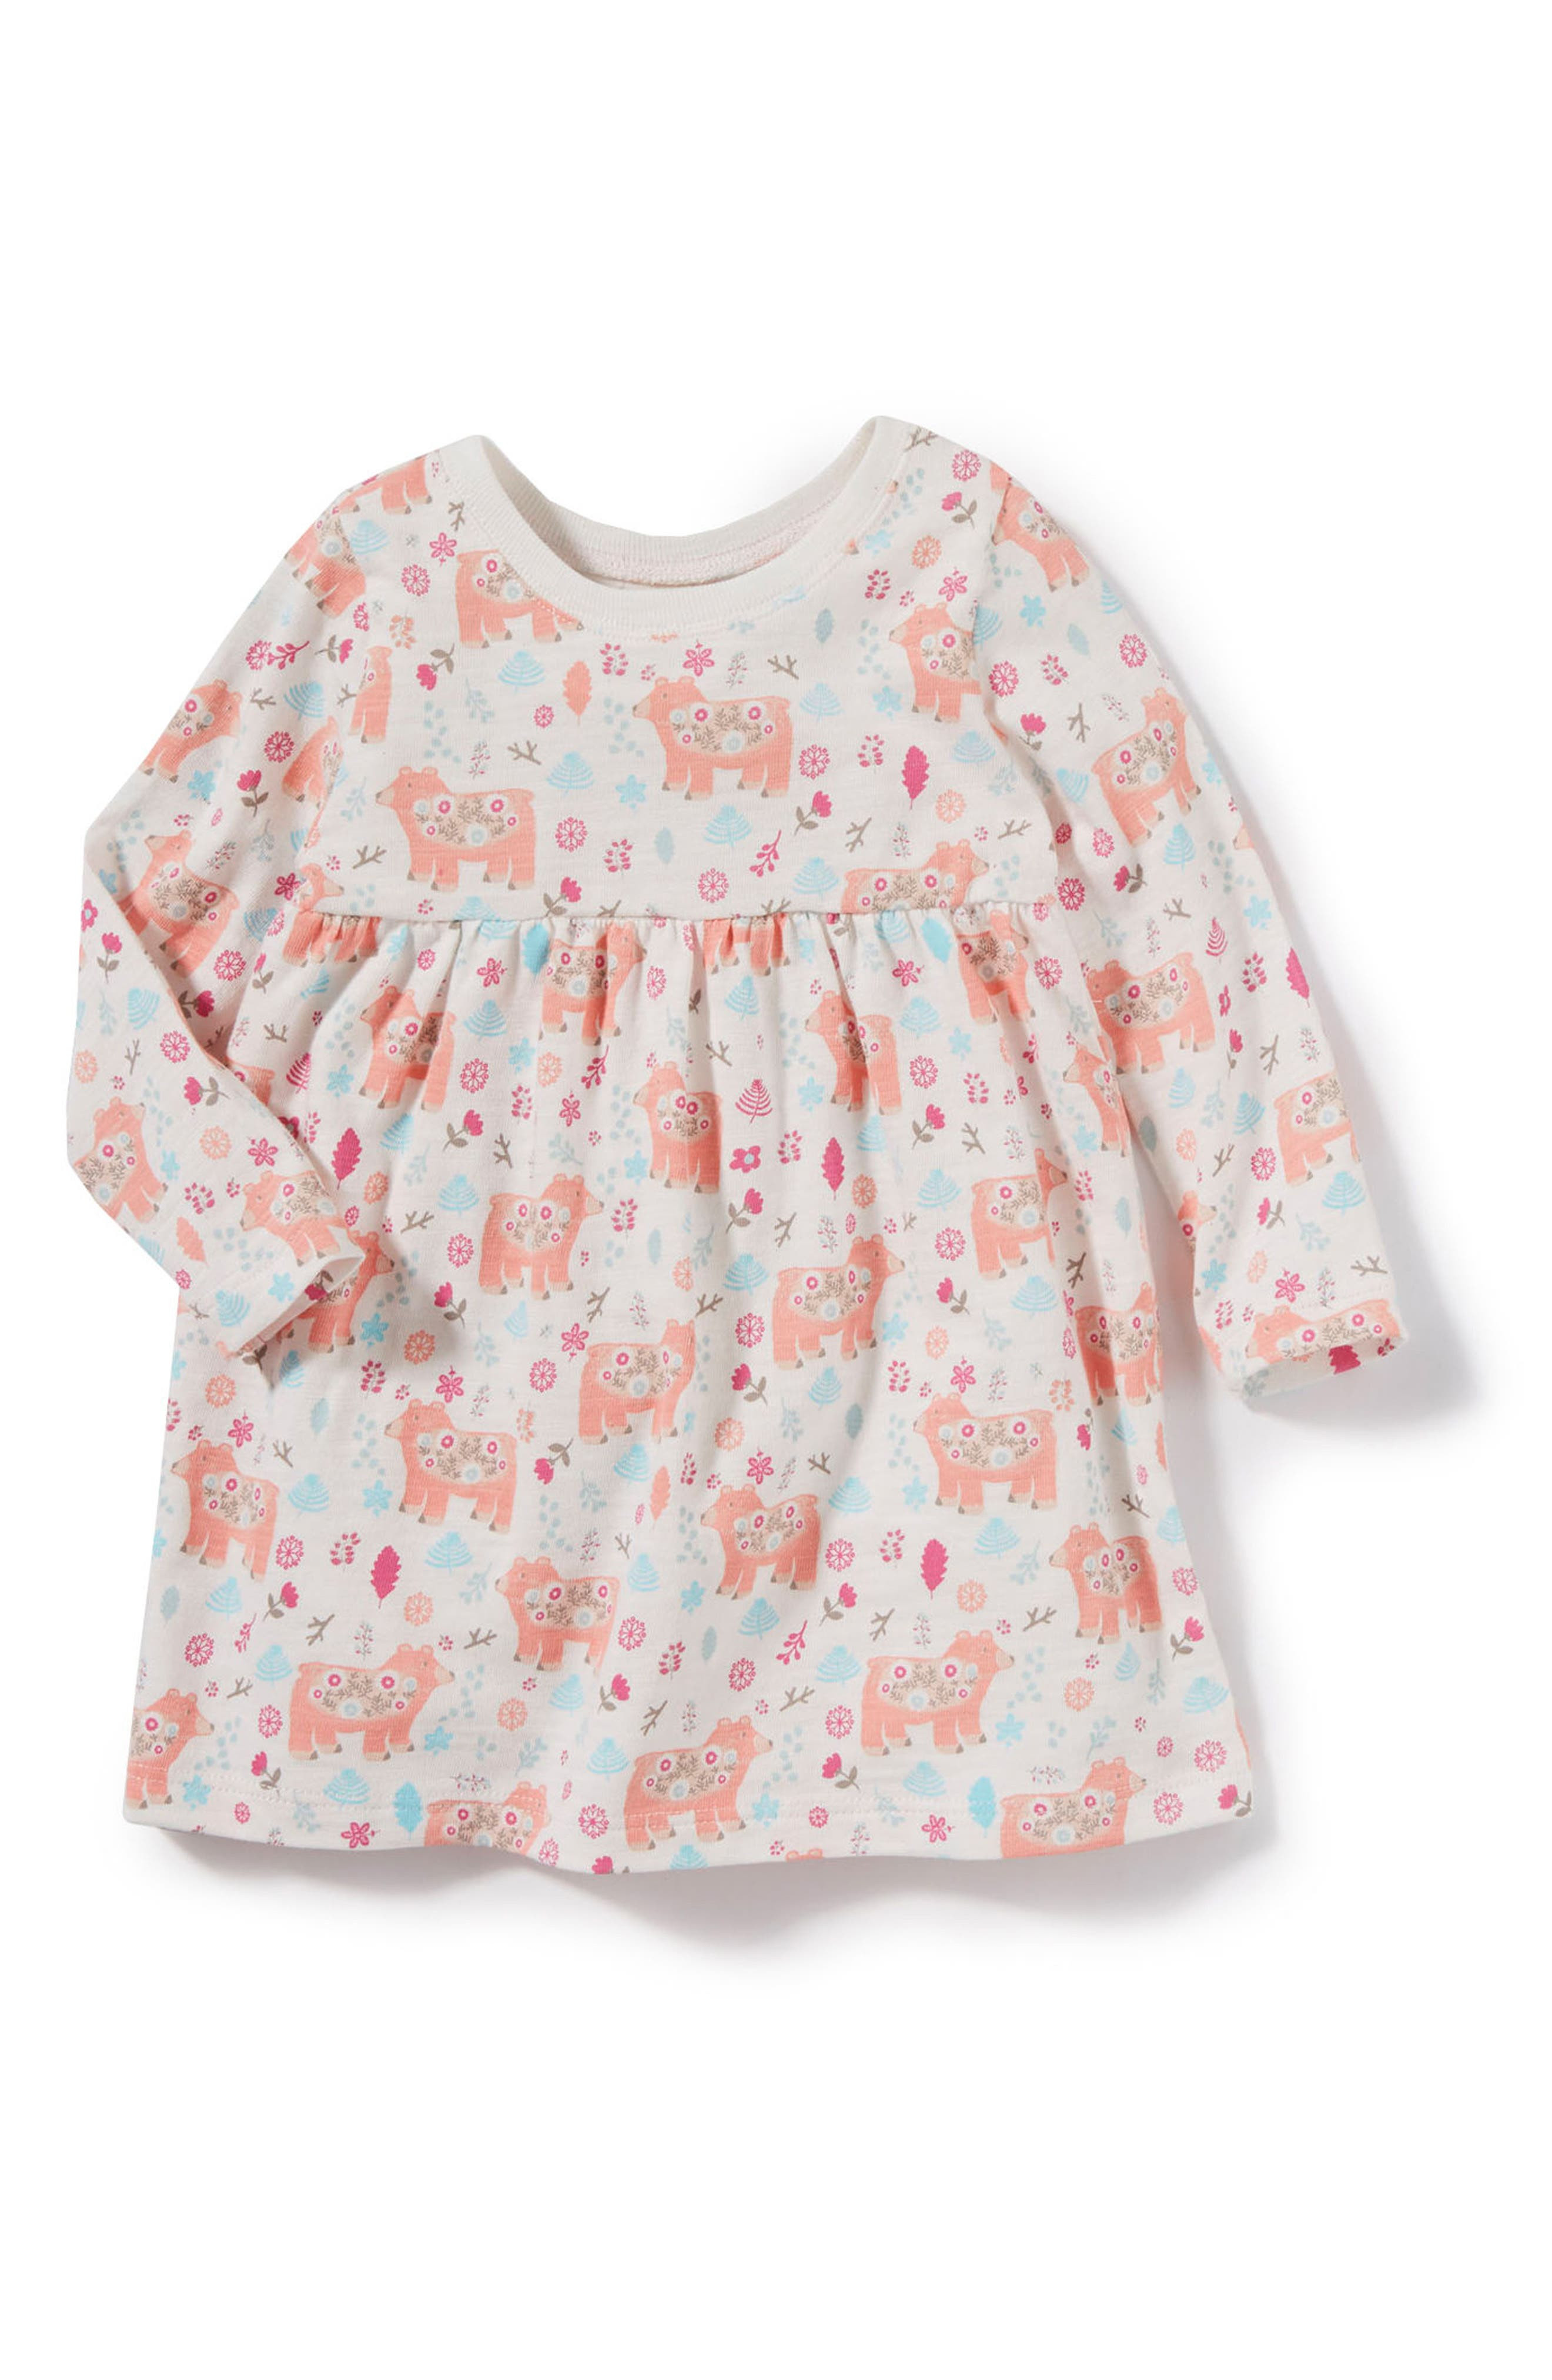 Peek Sloan Dress,                             Main thumbnail 1, color,                             905